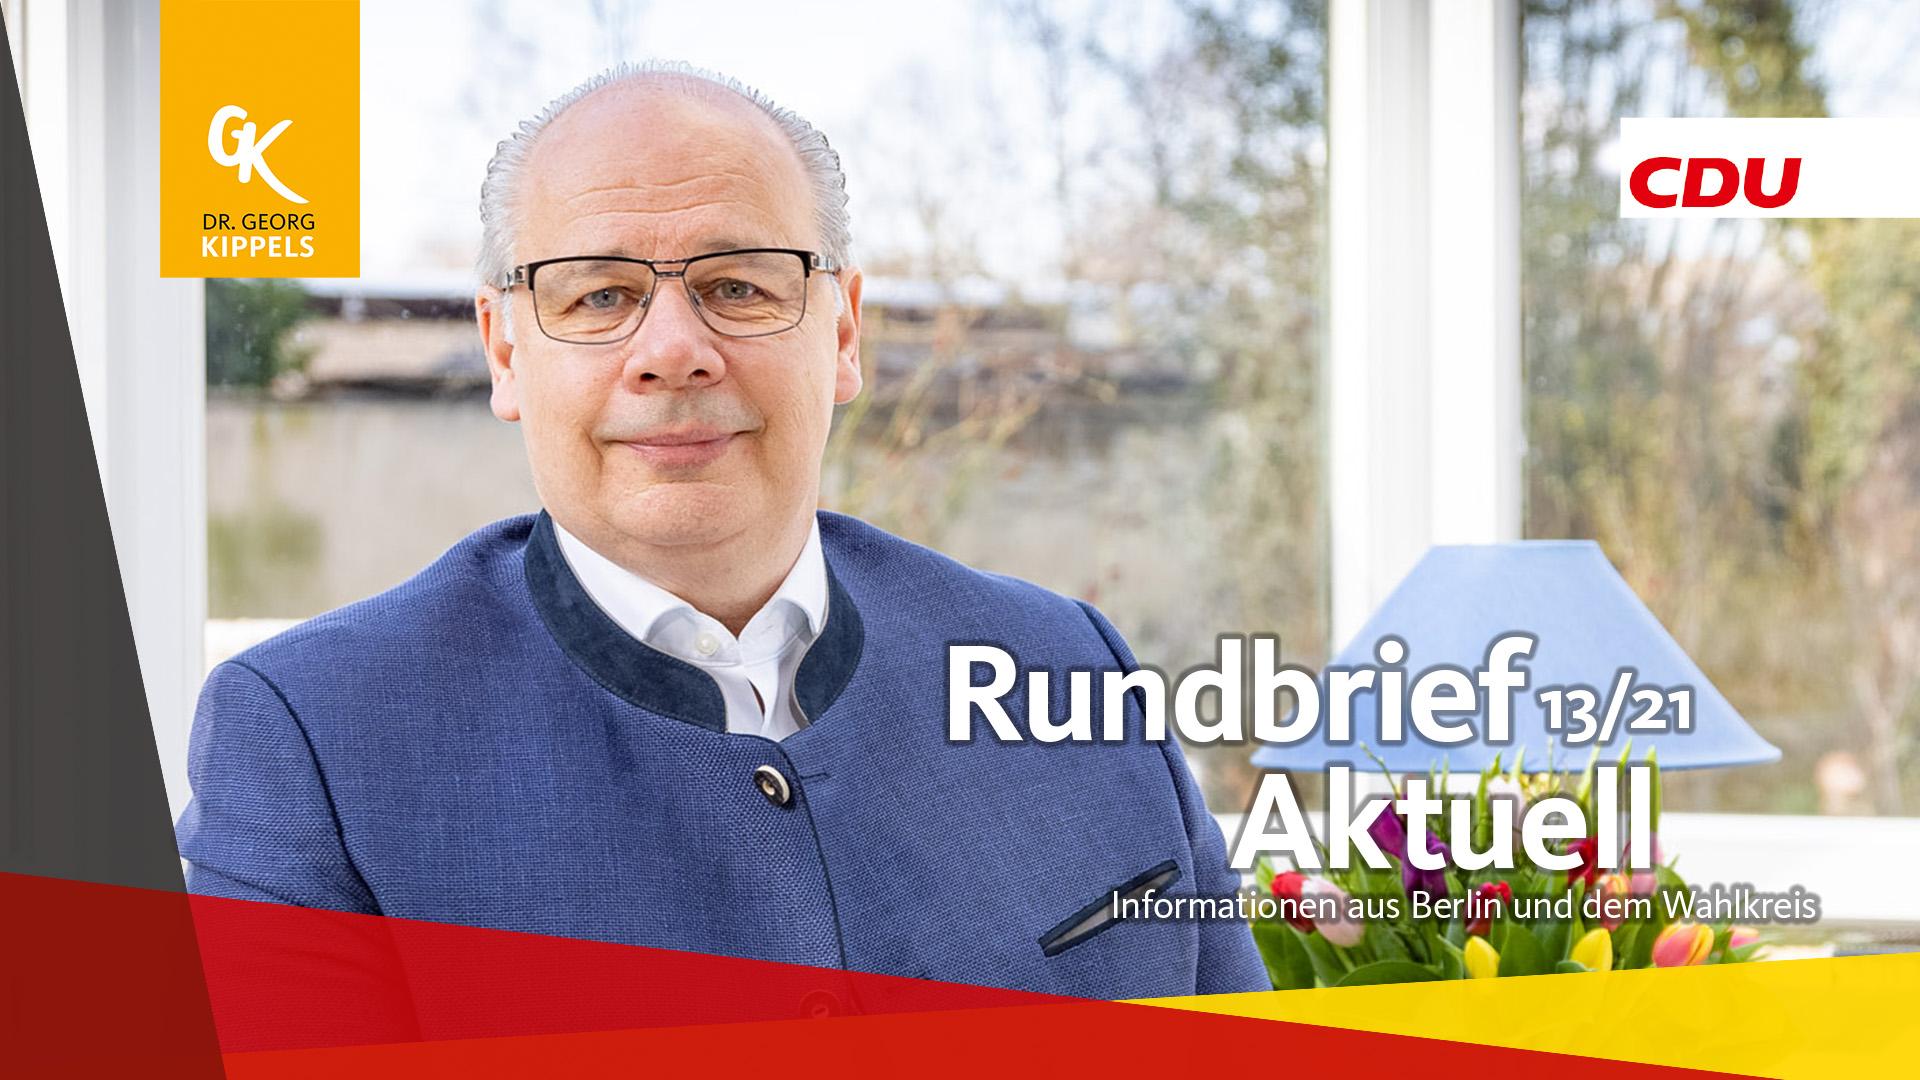 21kw13_HEAD-Rundbrief